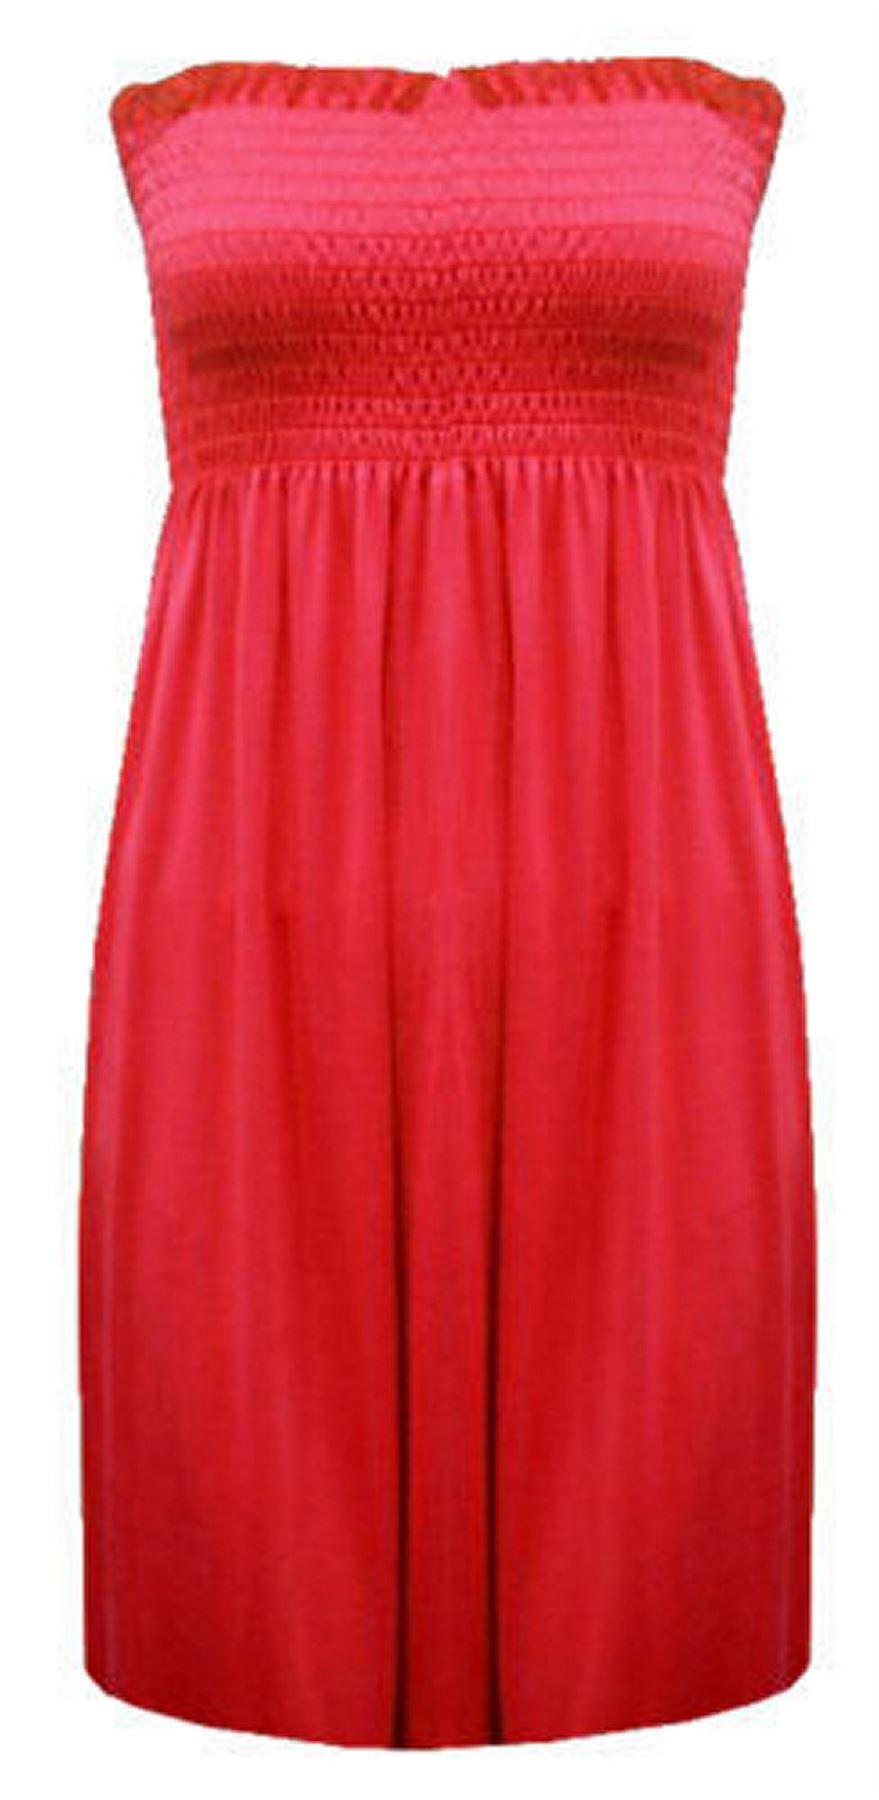 New-Ladies-Bandeau-Boob-Gathering-Tops-Boob-Tube-Beach-Wear-Tunics-8-26 thumbnail 60